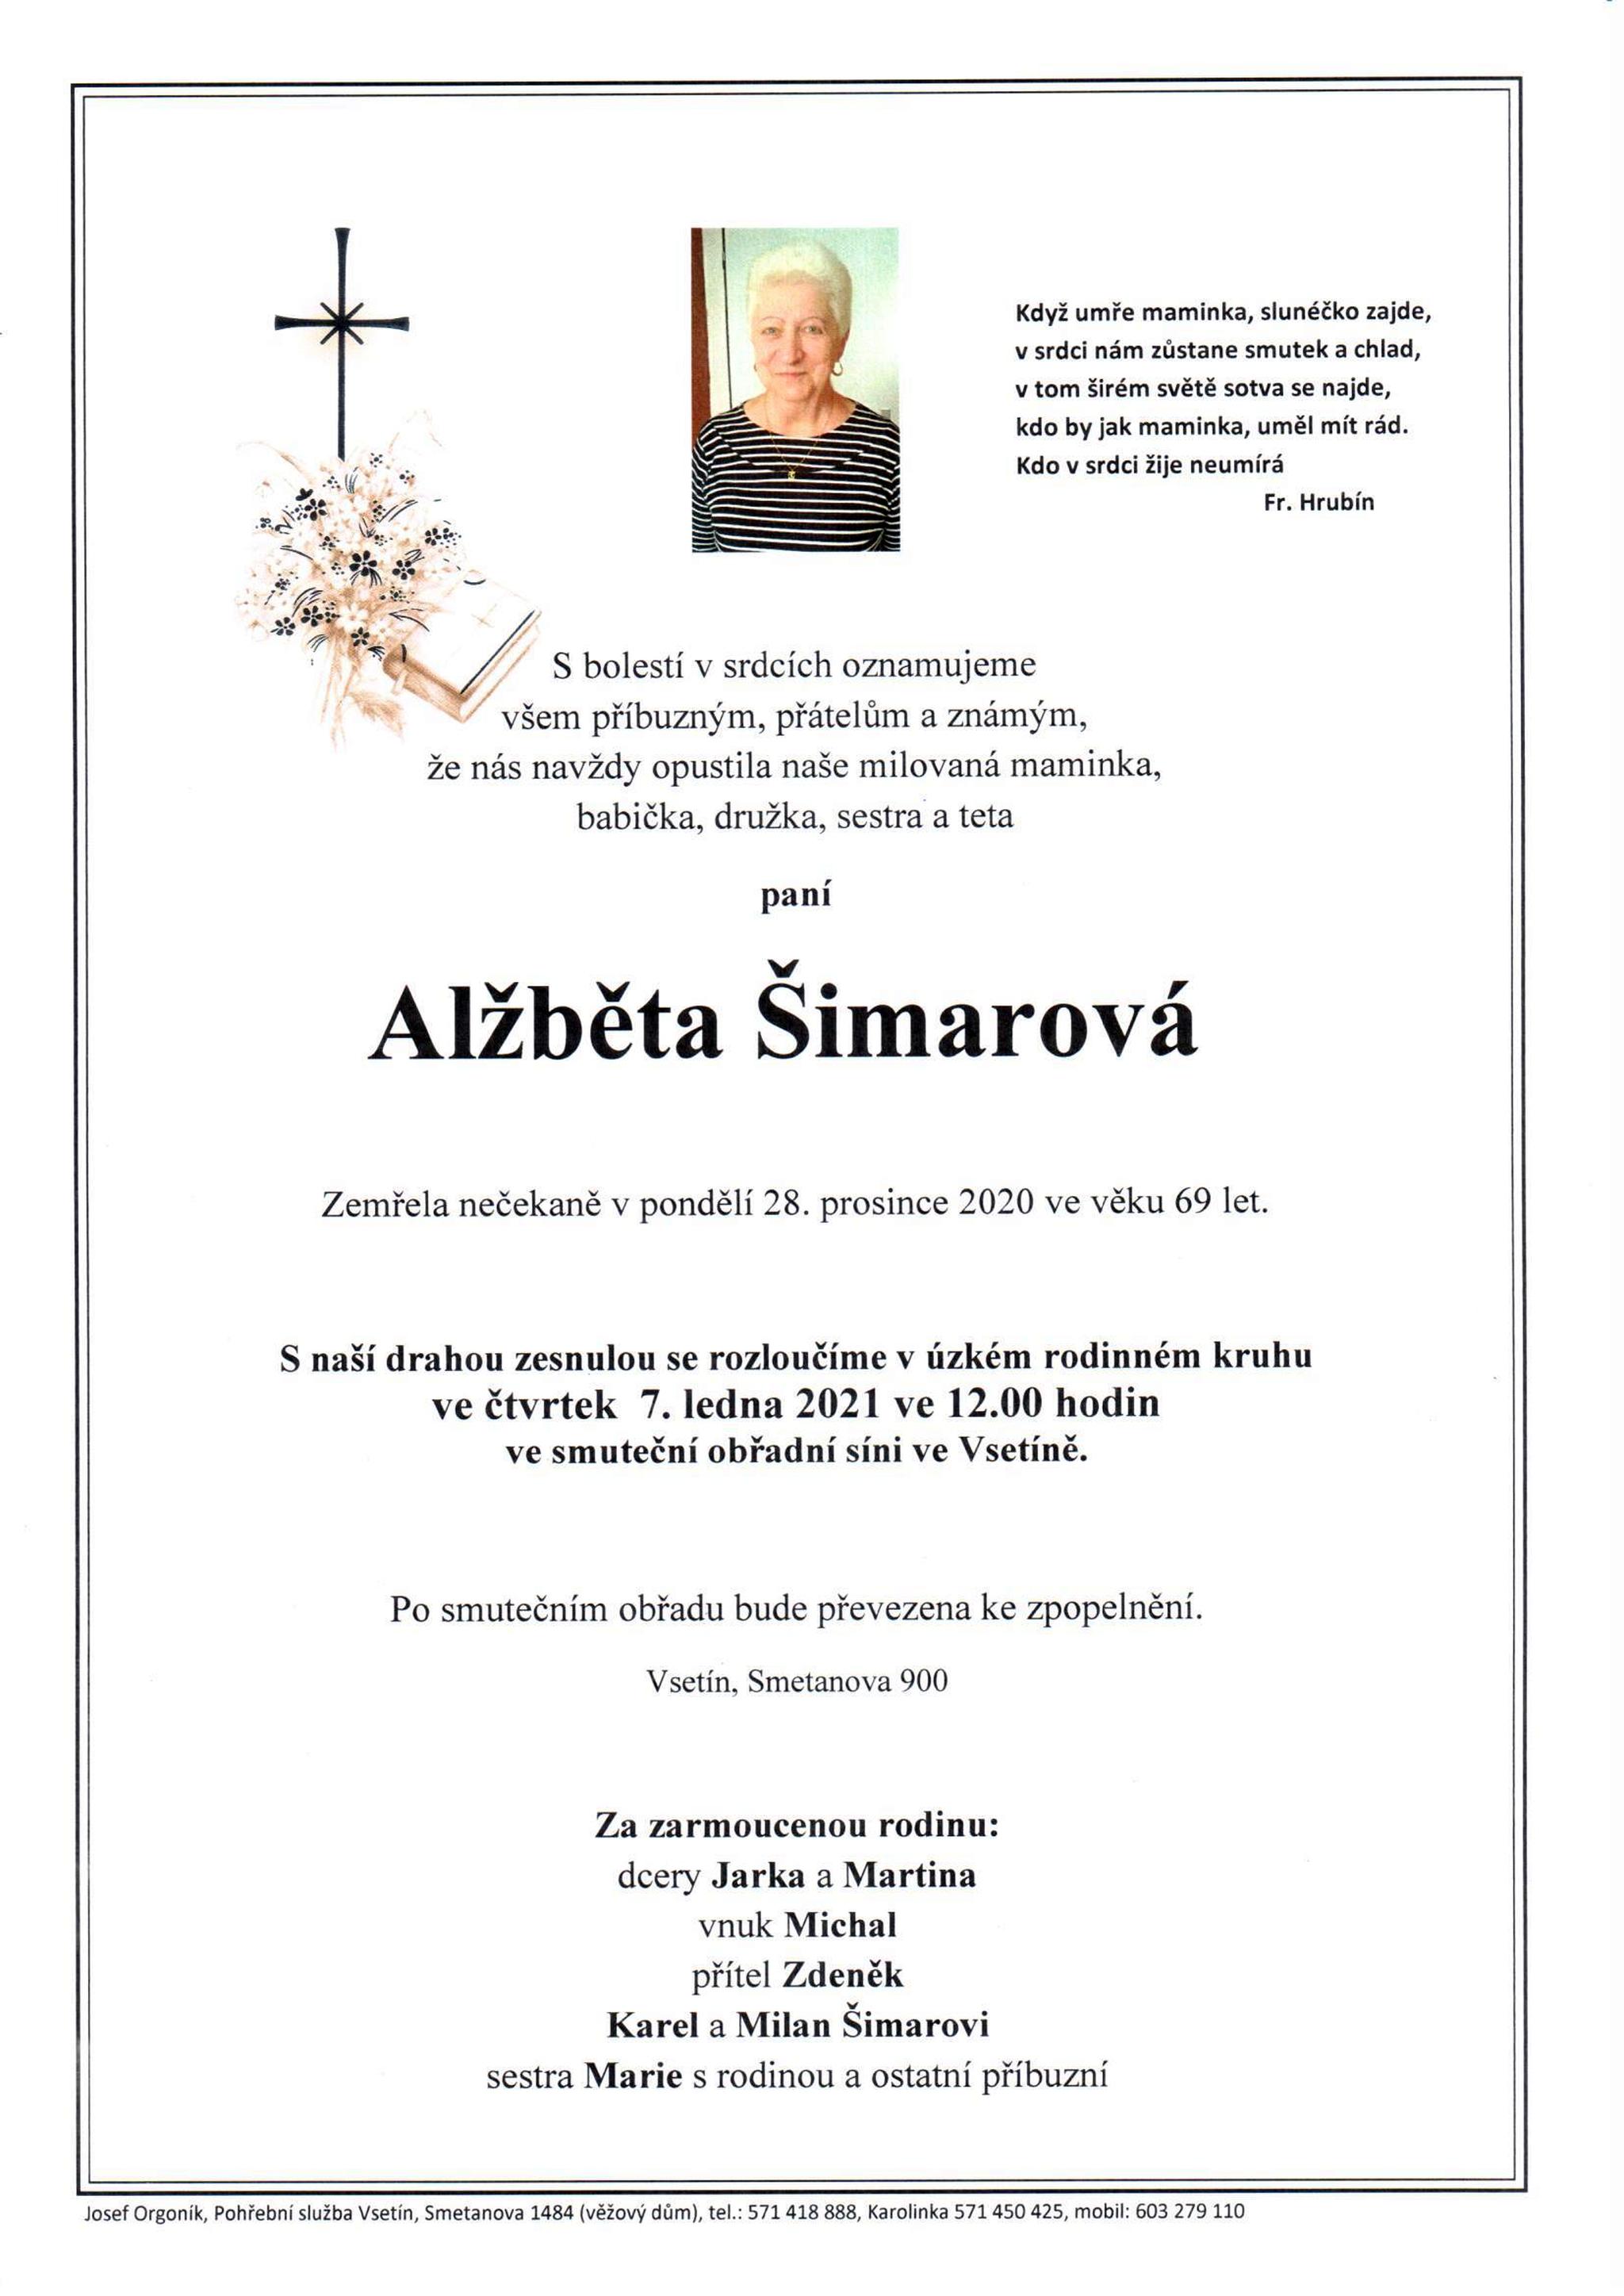 Alžběta Šimarová